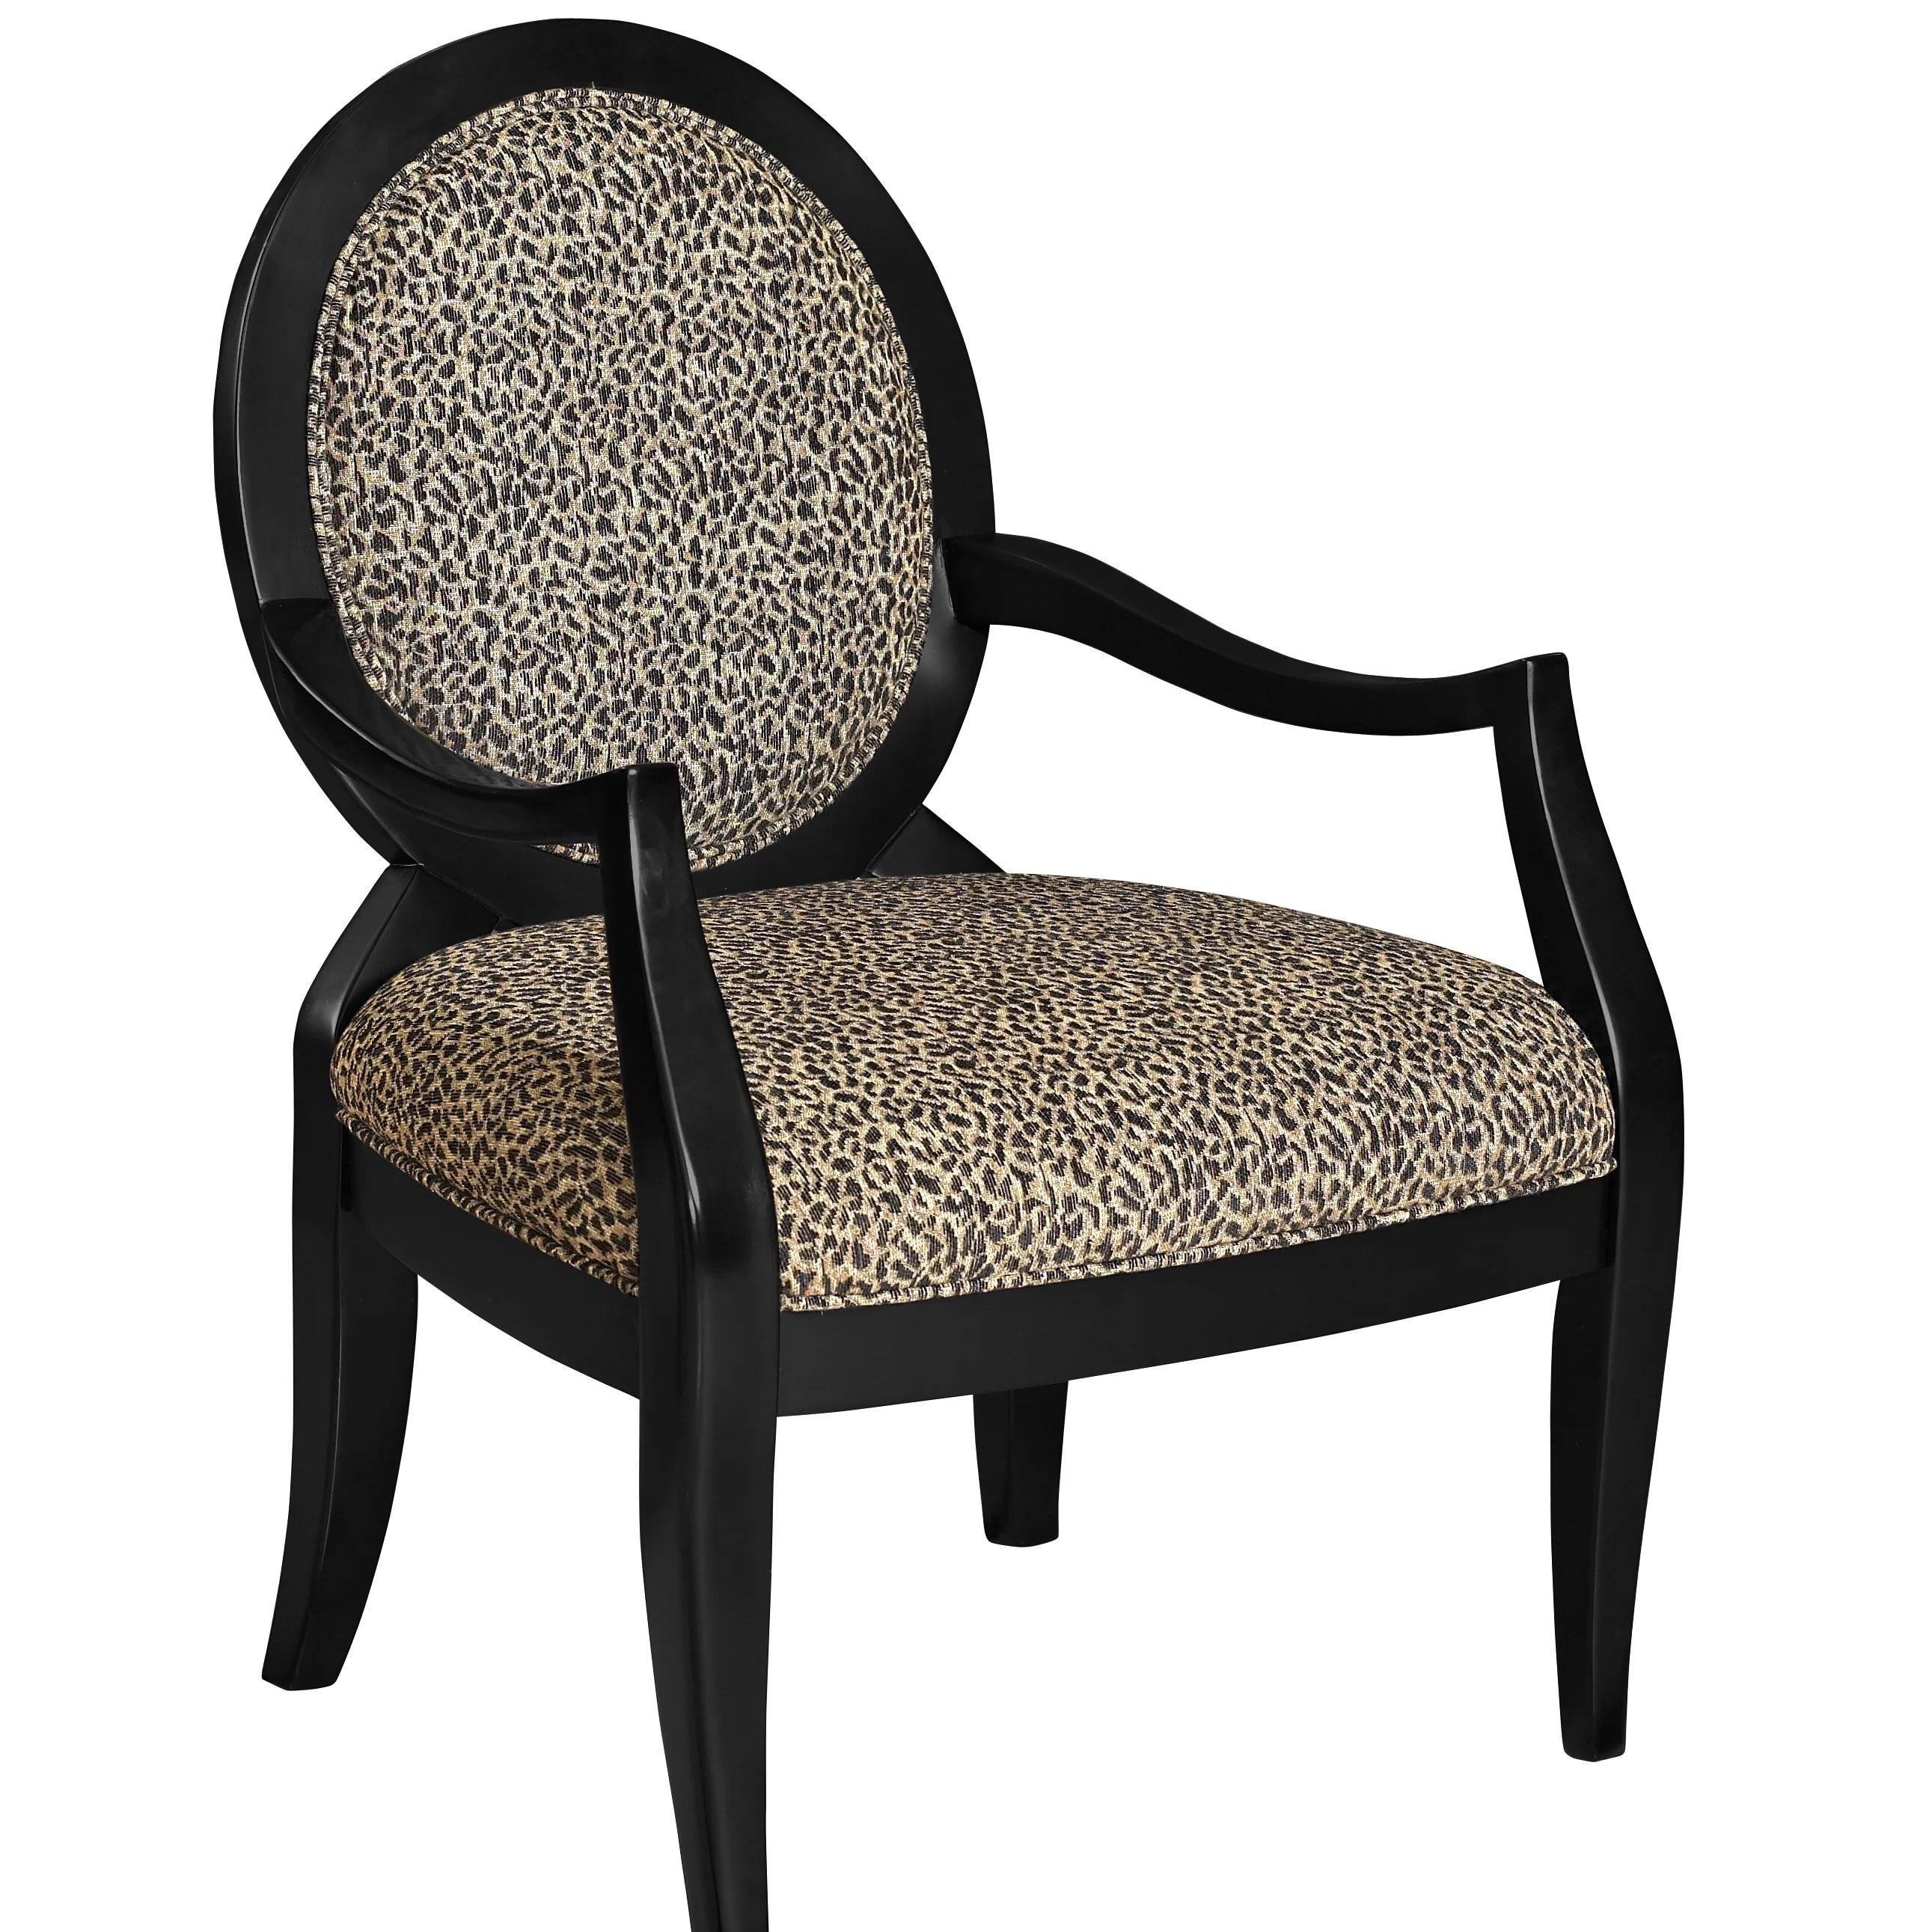 cheetah print accent chairs xxl bean bag chair powell classic seating leopard fabric arm and reviews